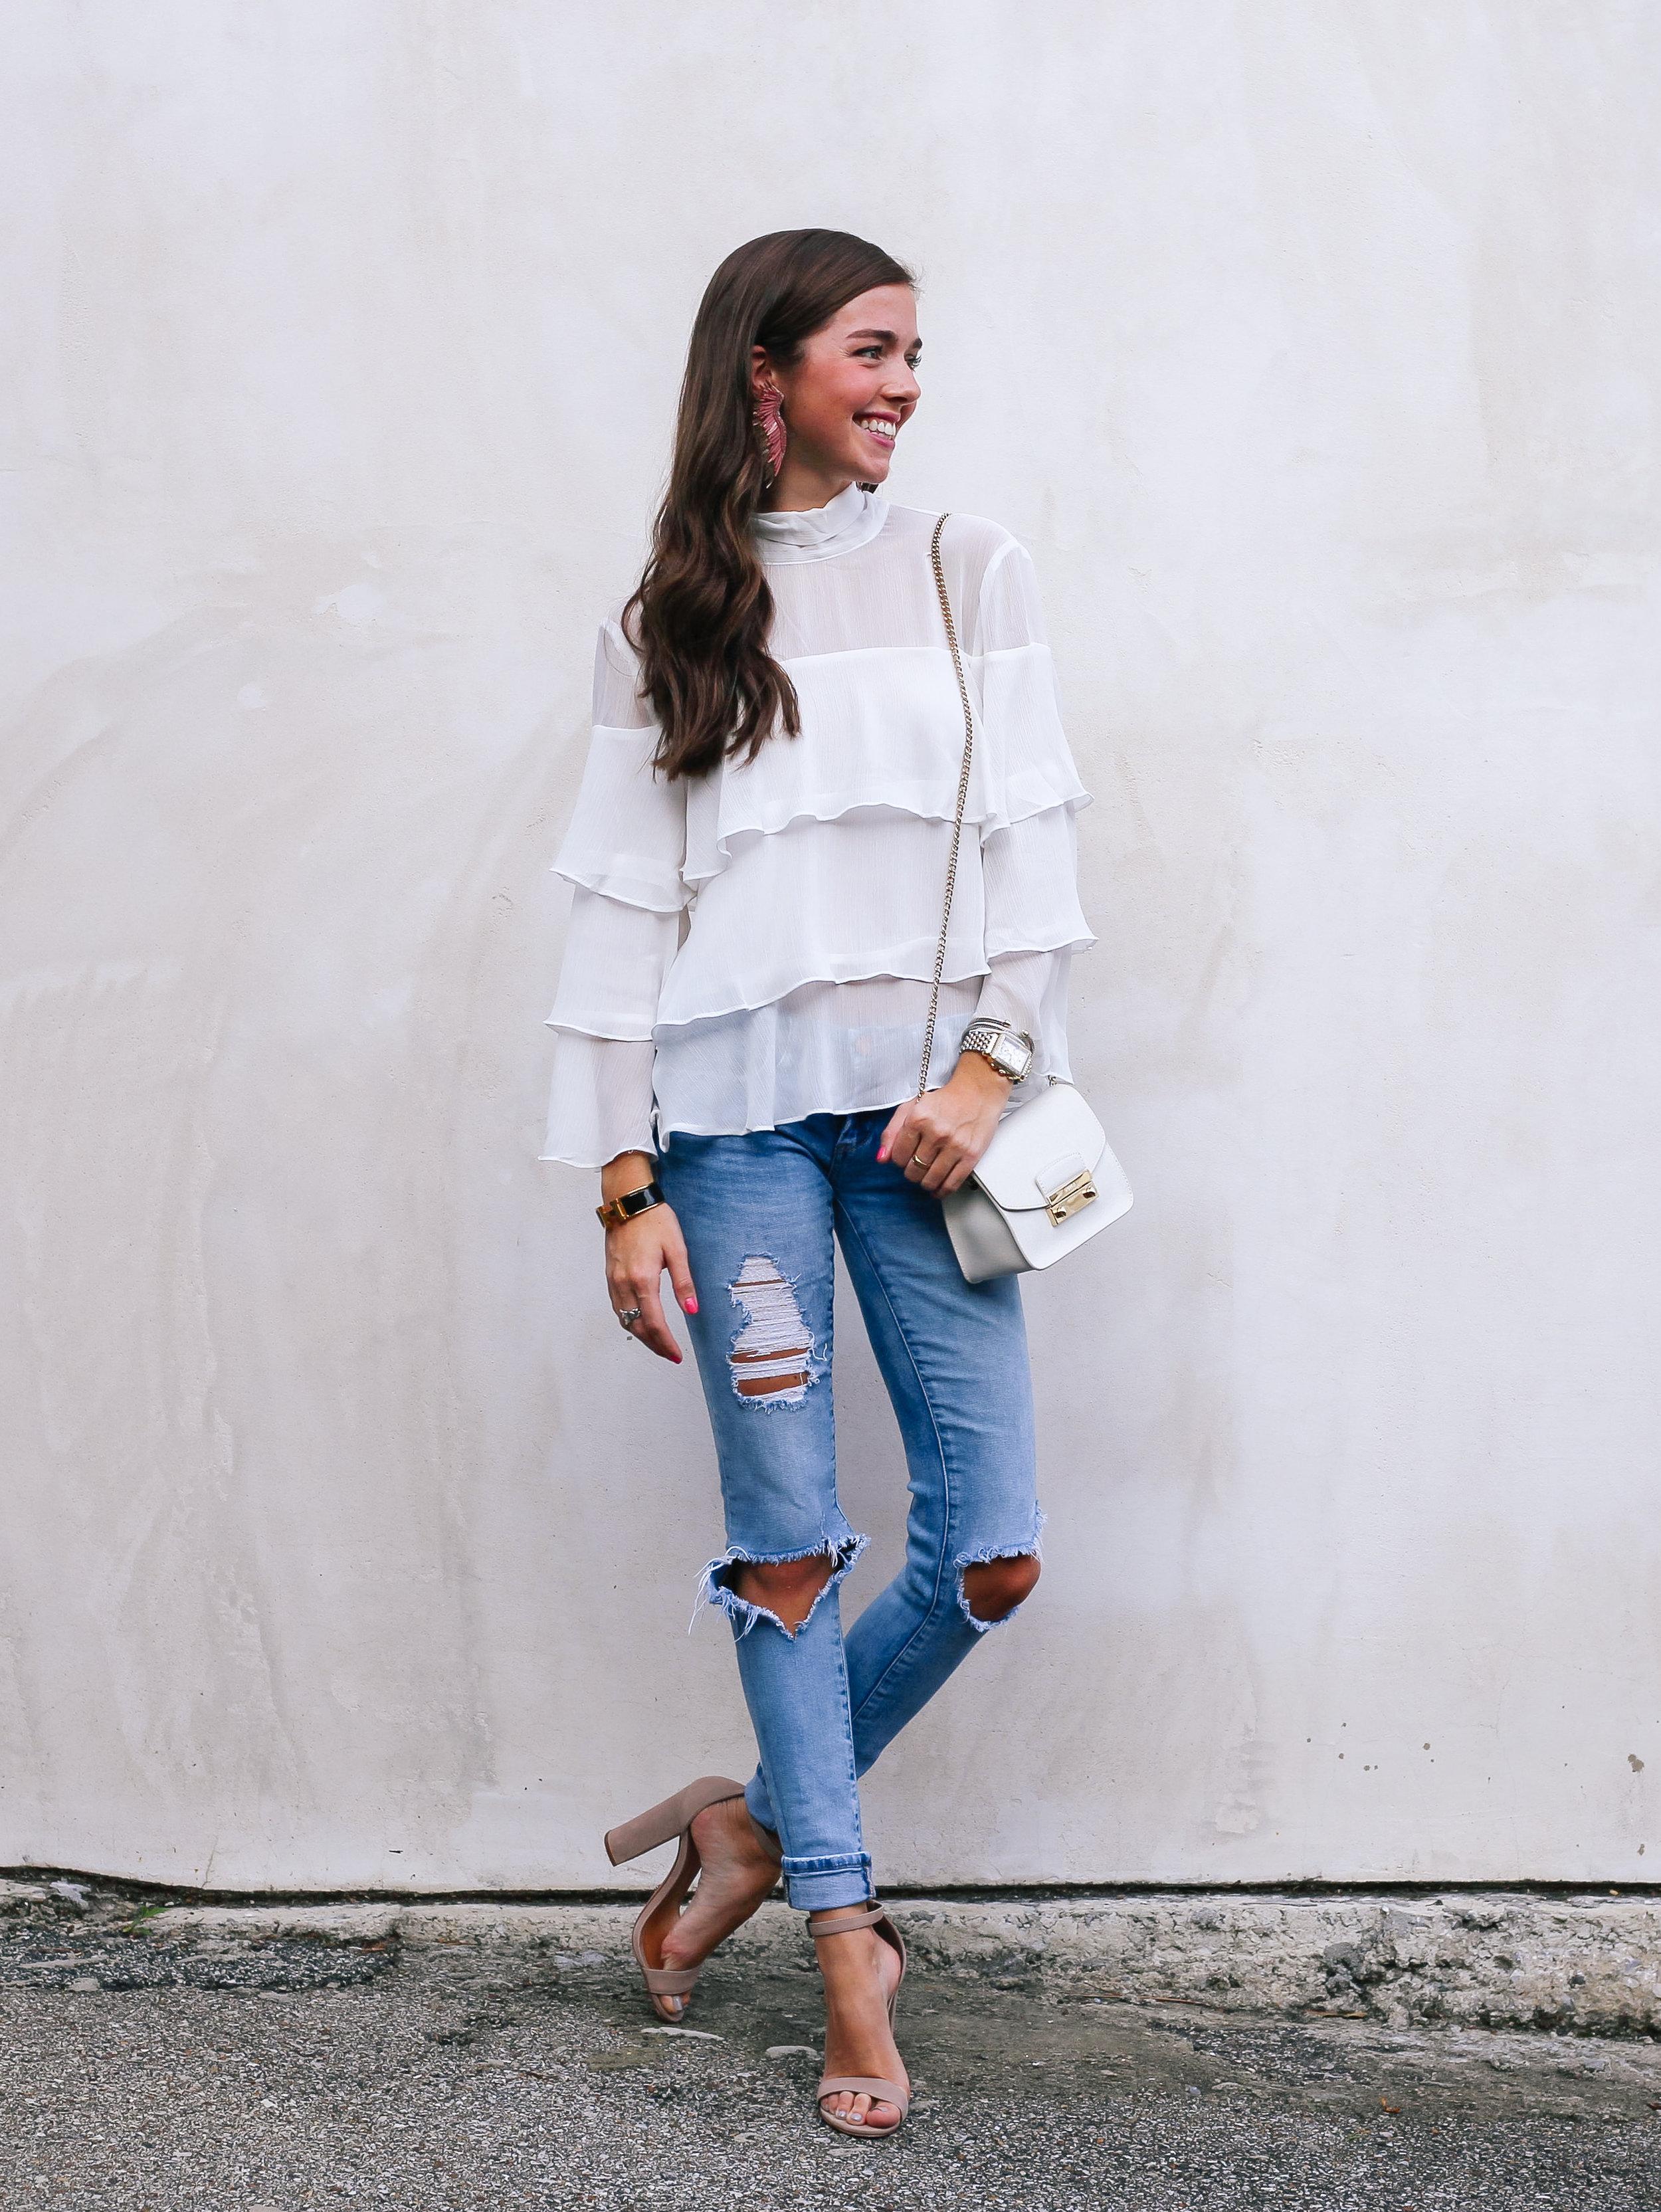 fashion blogger lcb style mignonne gavigan ruffle top schutz shoes (4 of 55).jpg